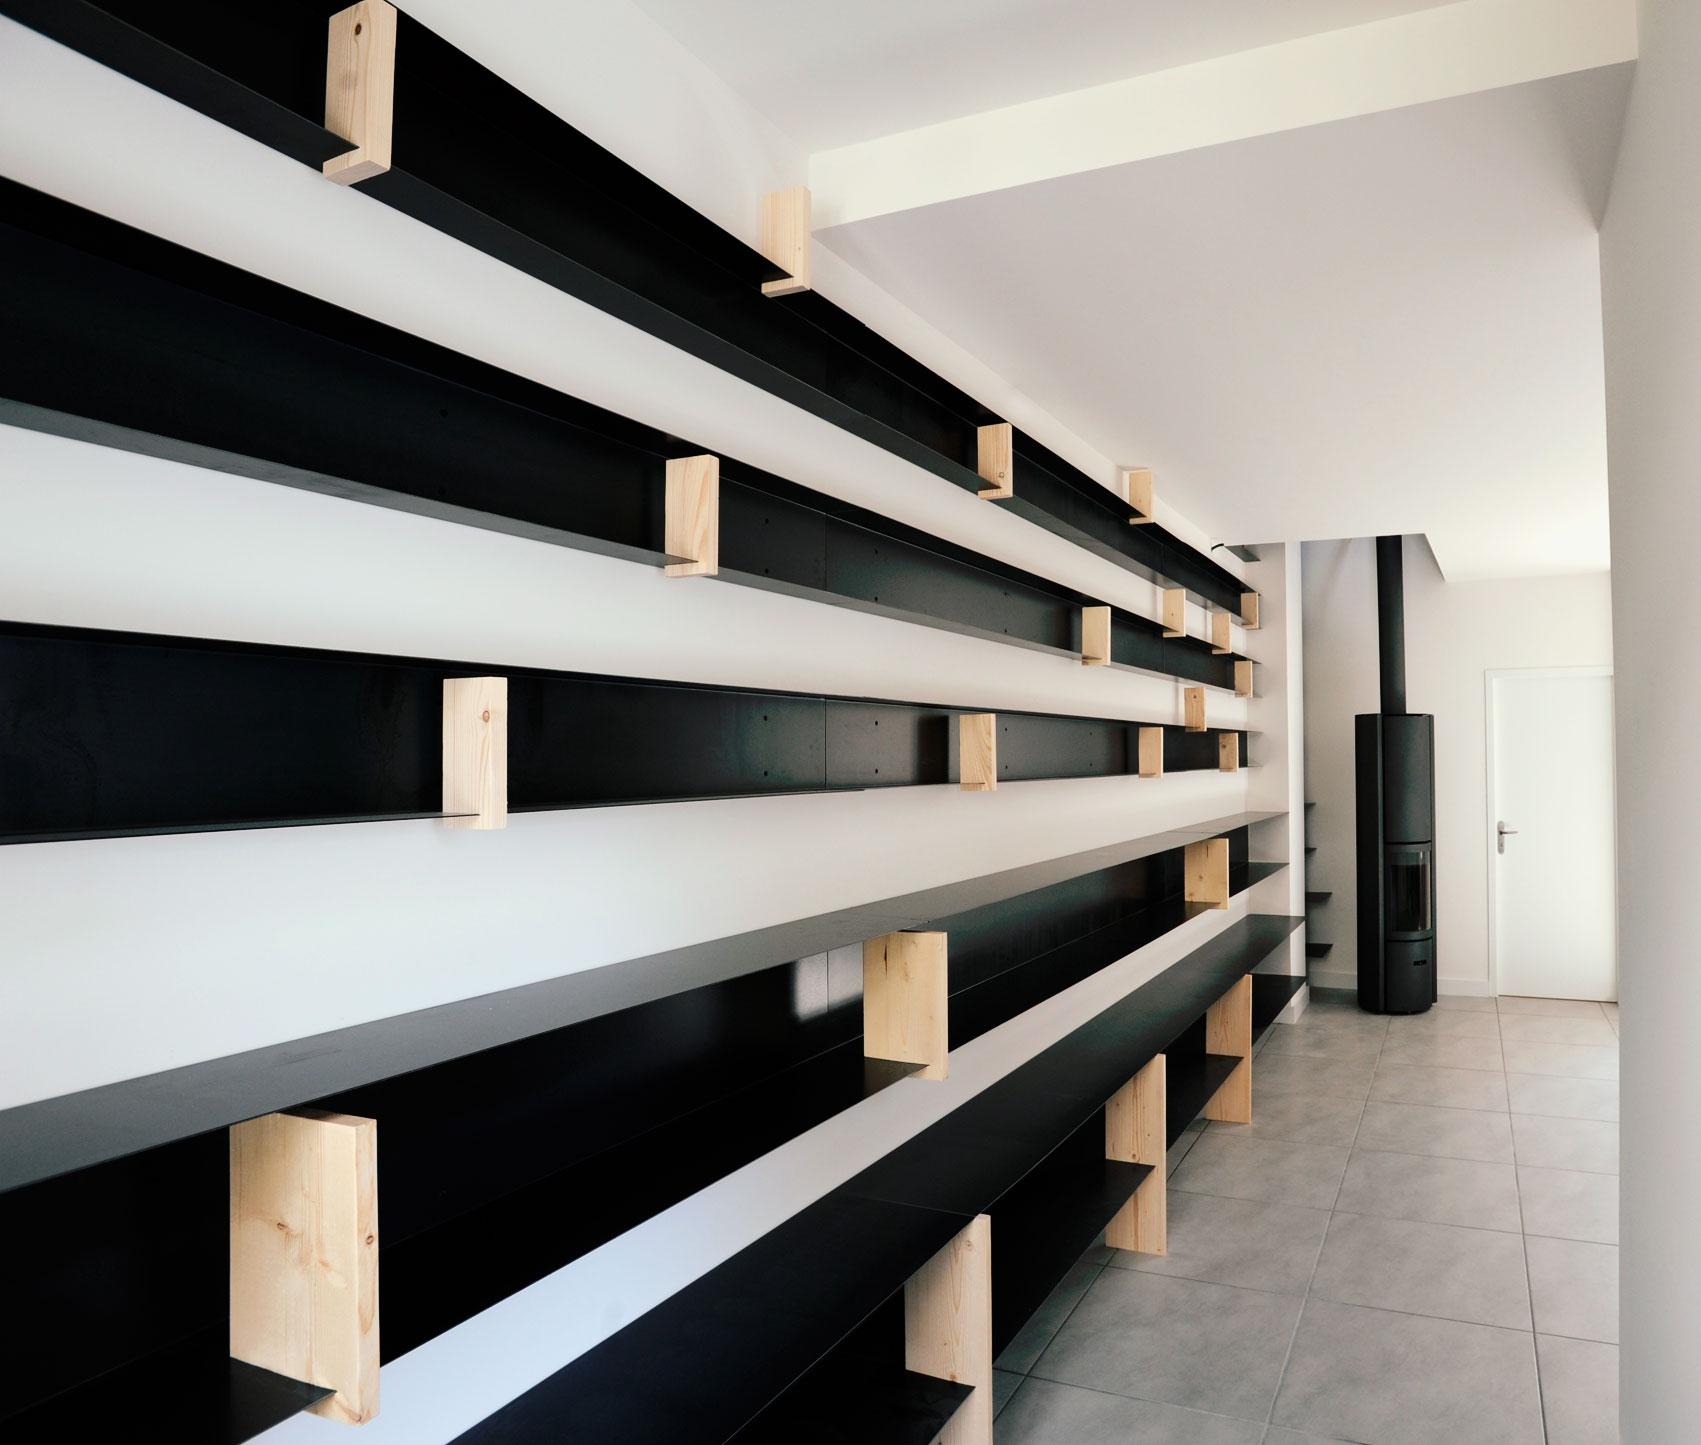 cinq milles livres aie. Black Bedroom Furniture Sets. Home Design Ideas